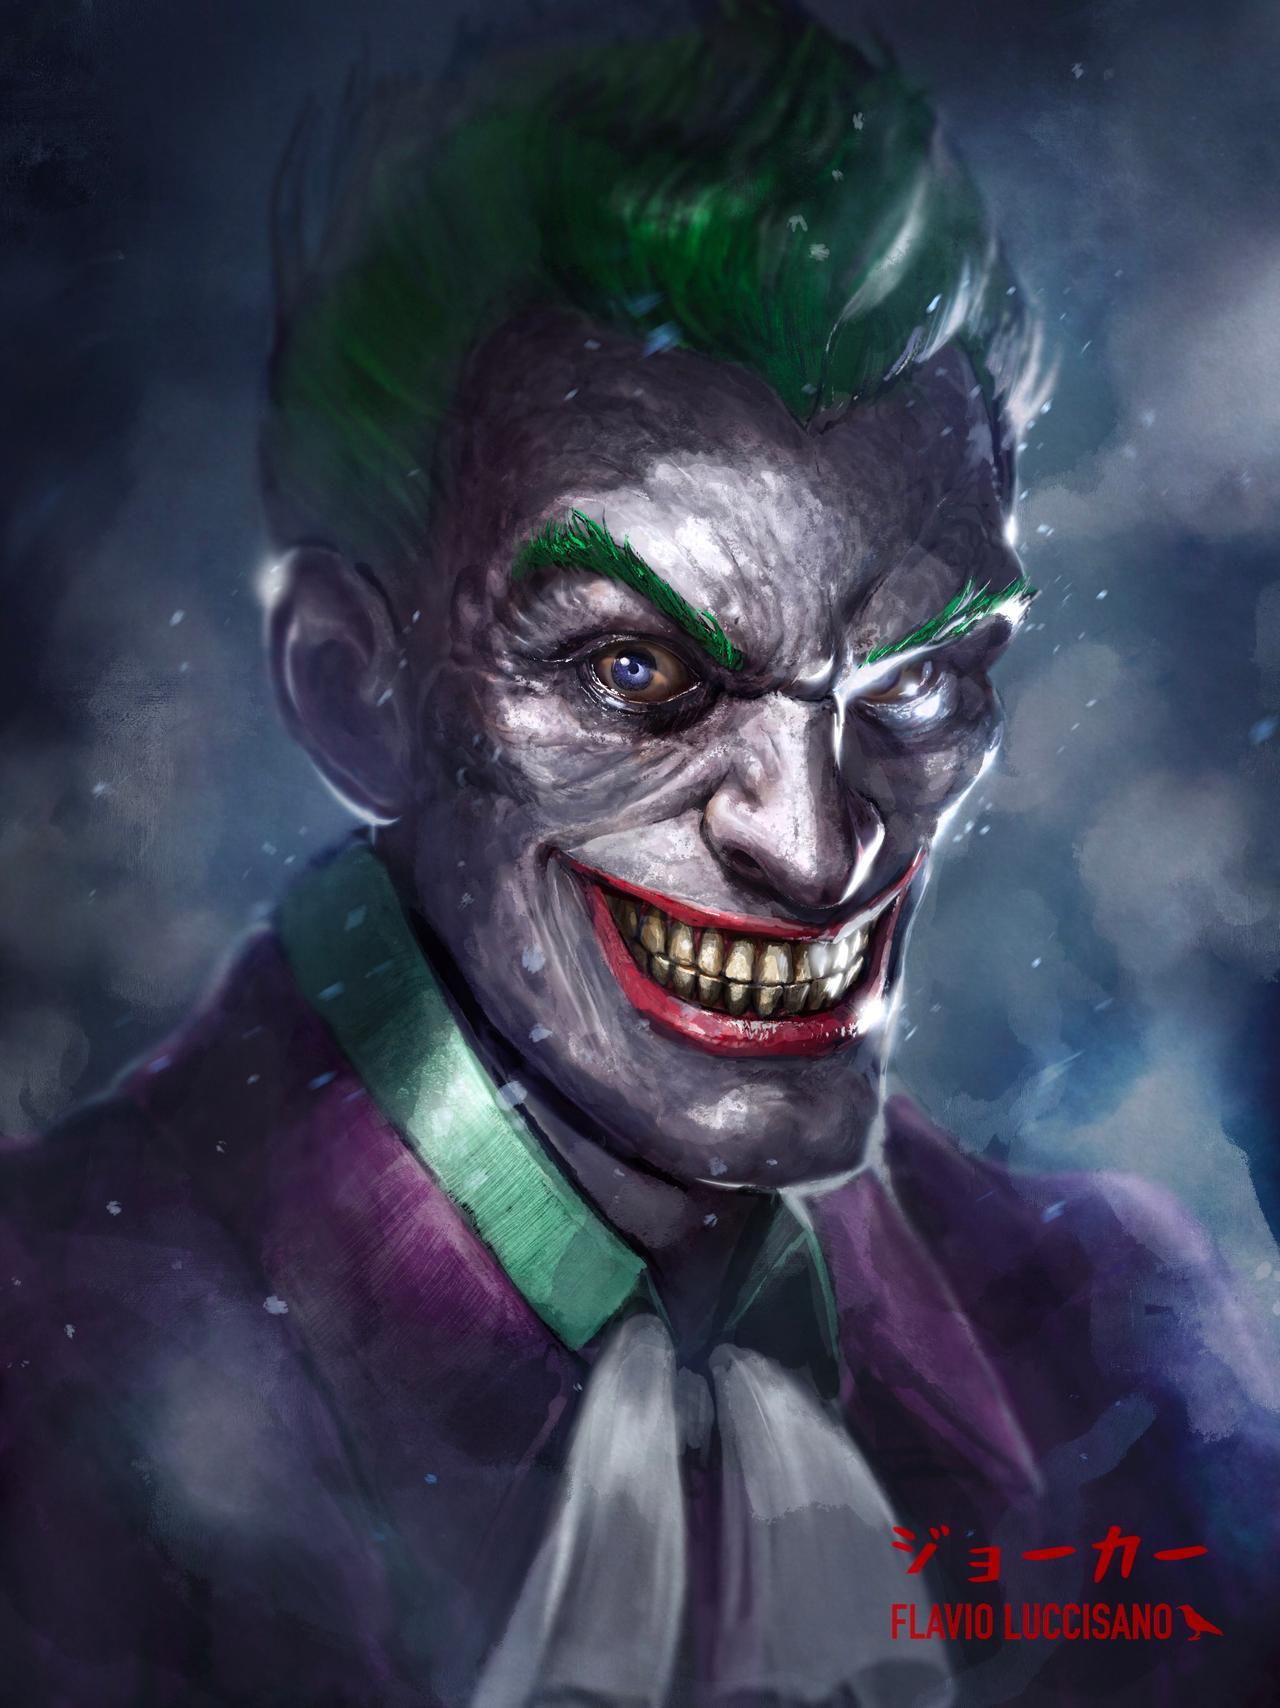 joker_by_flavioluccisano_ddvoc4k-fullvie